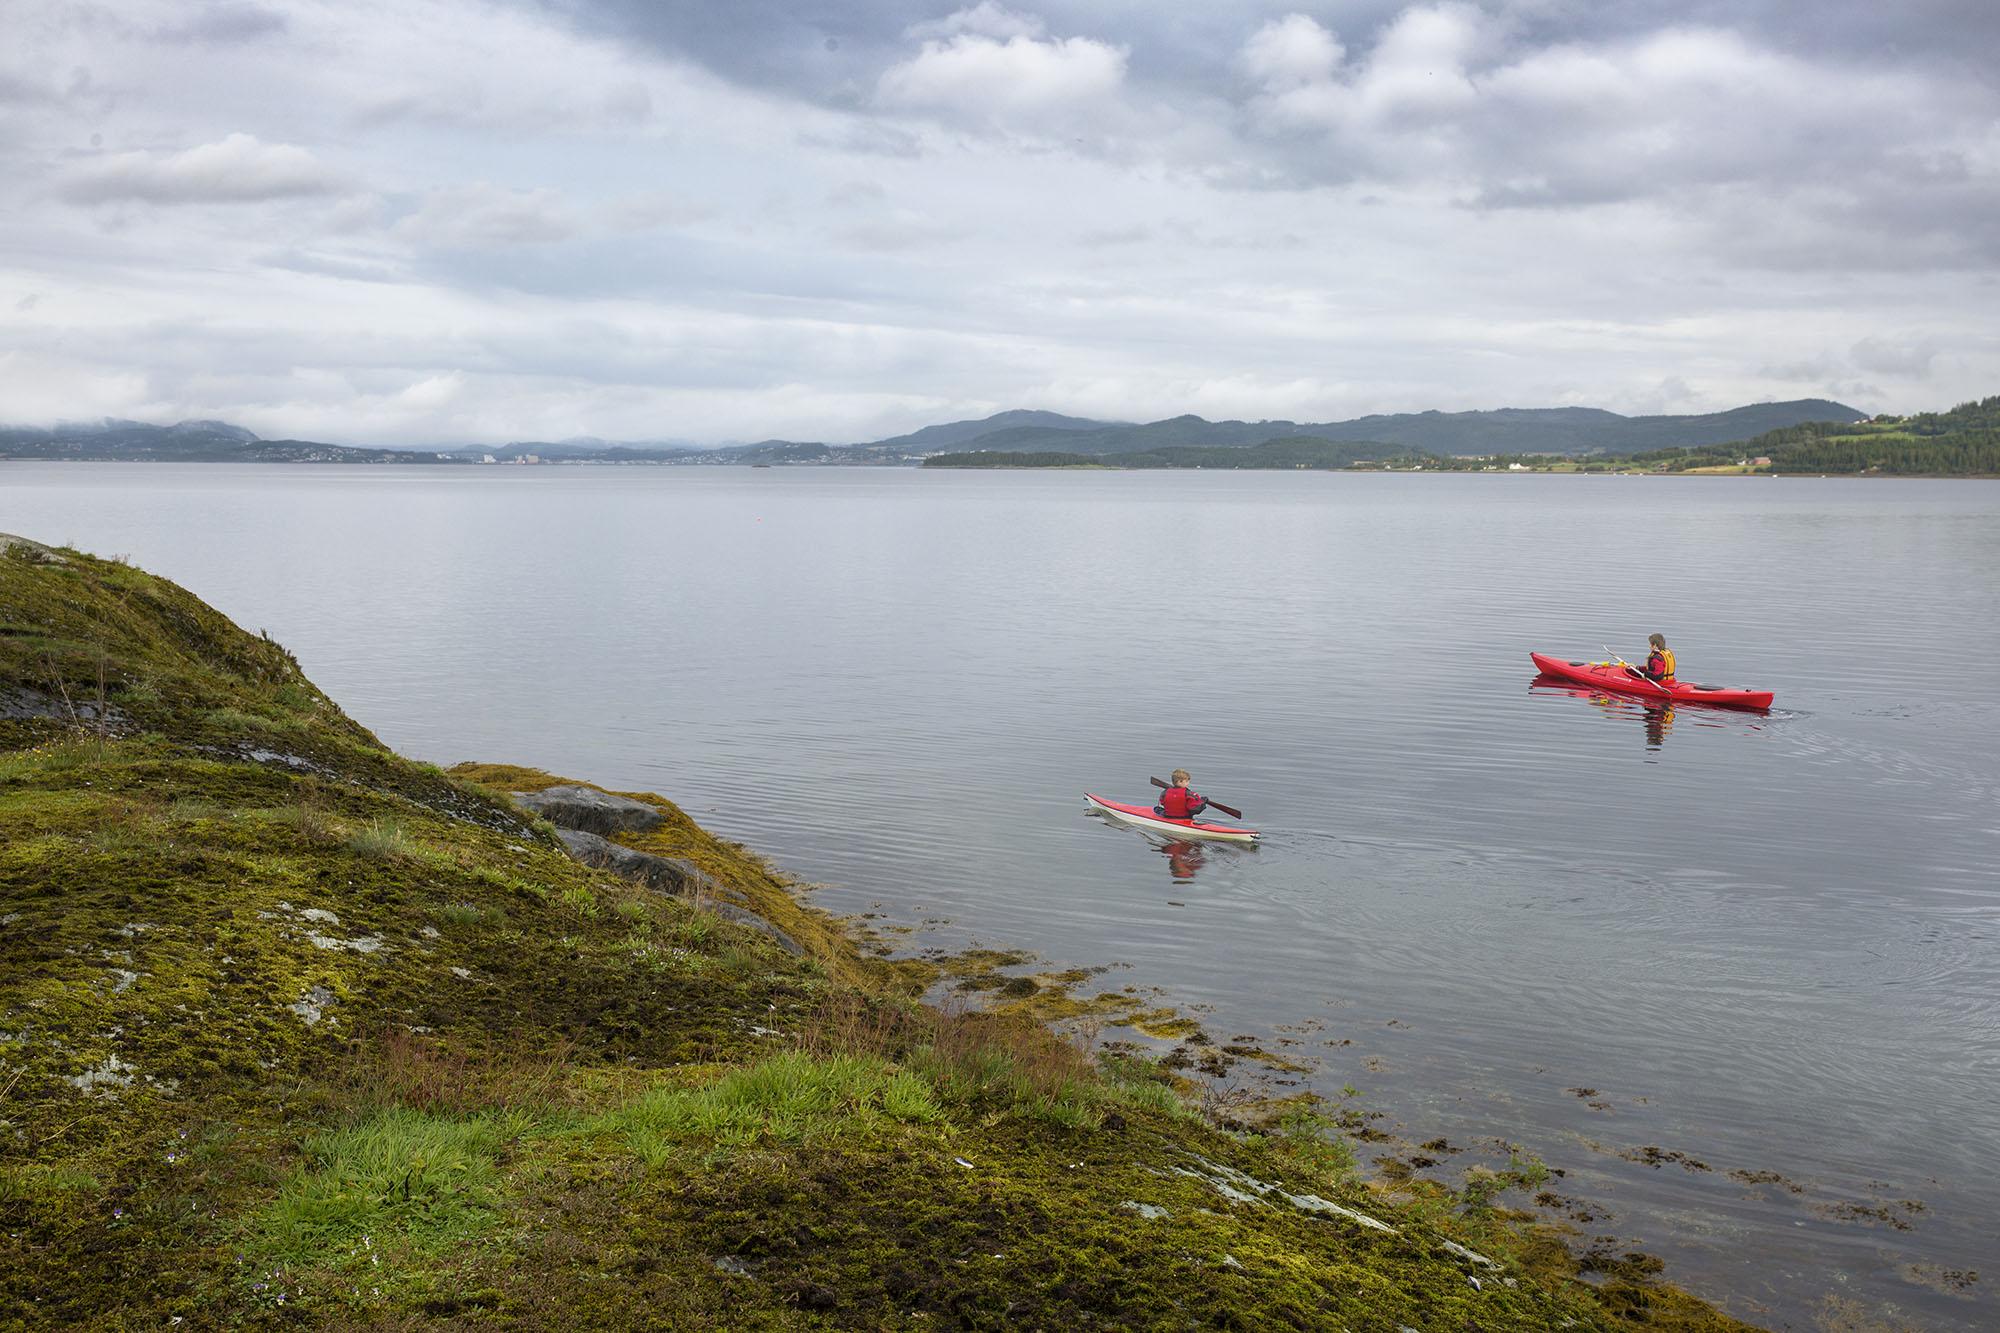 Kajakking på Skjelvågen i InderøyInderøy